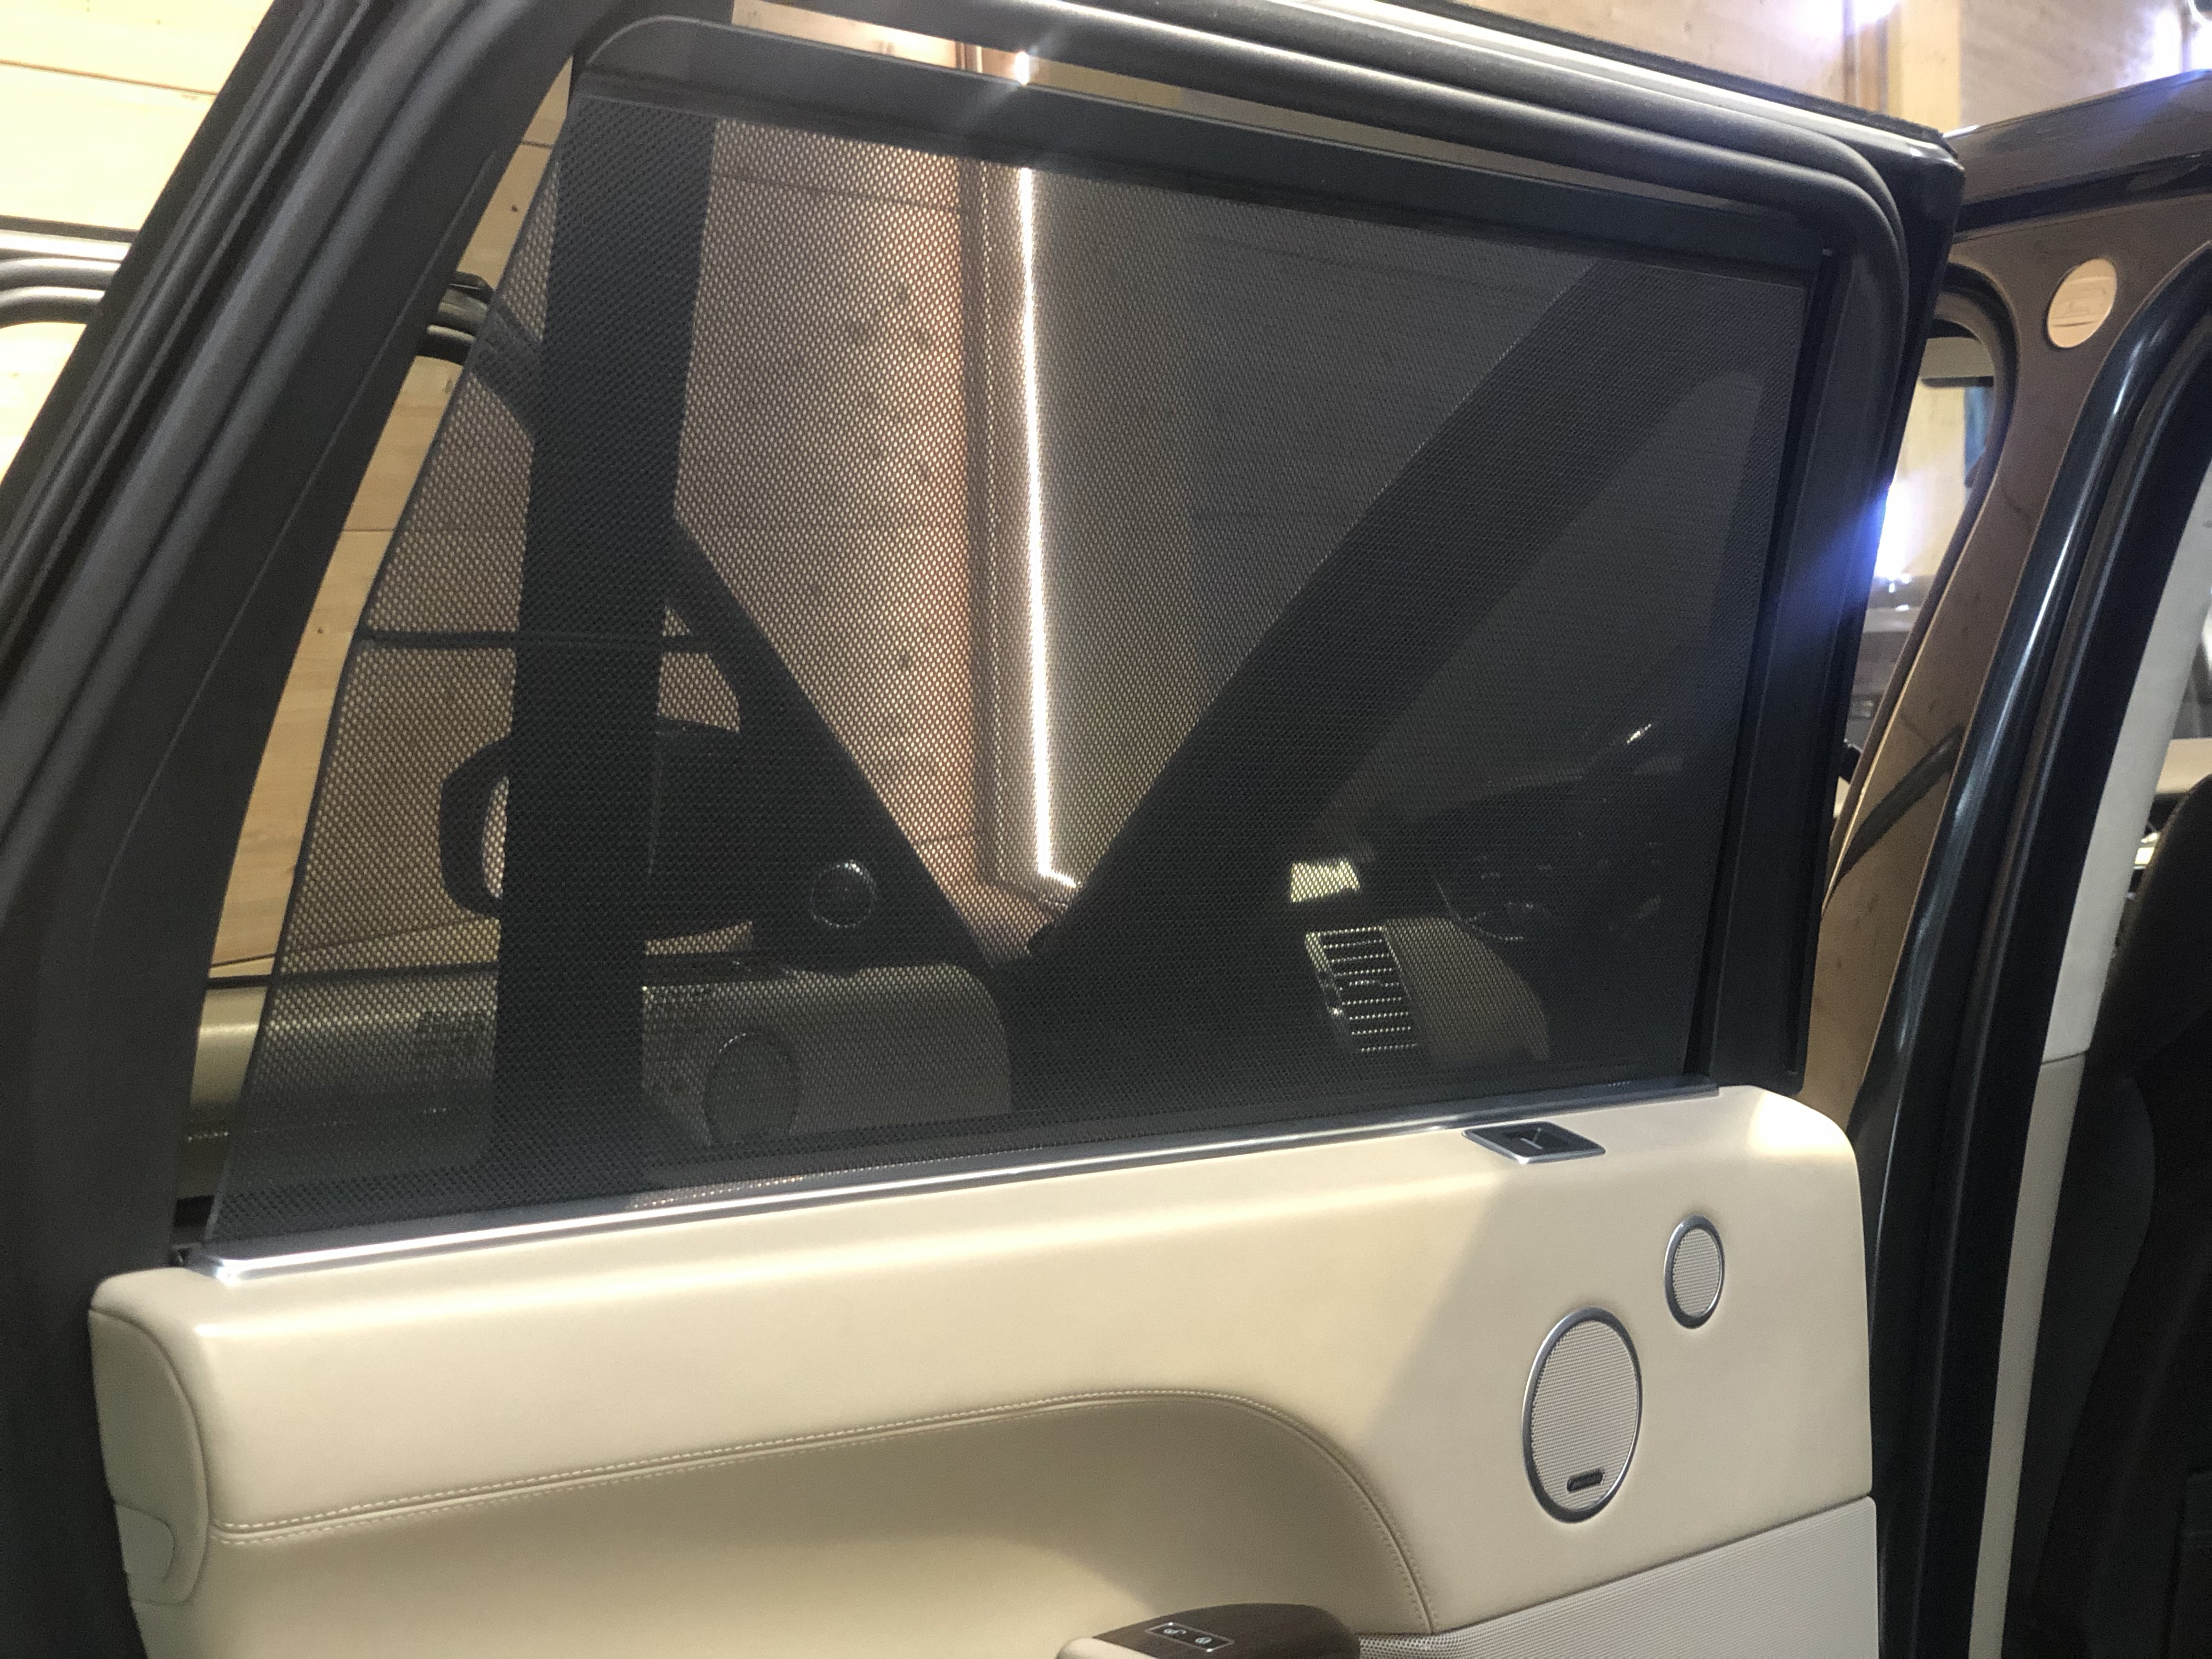 Land Rover Range Rover 4.4 SdV8 Autobiography LWB